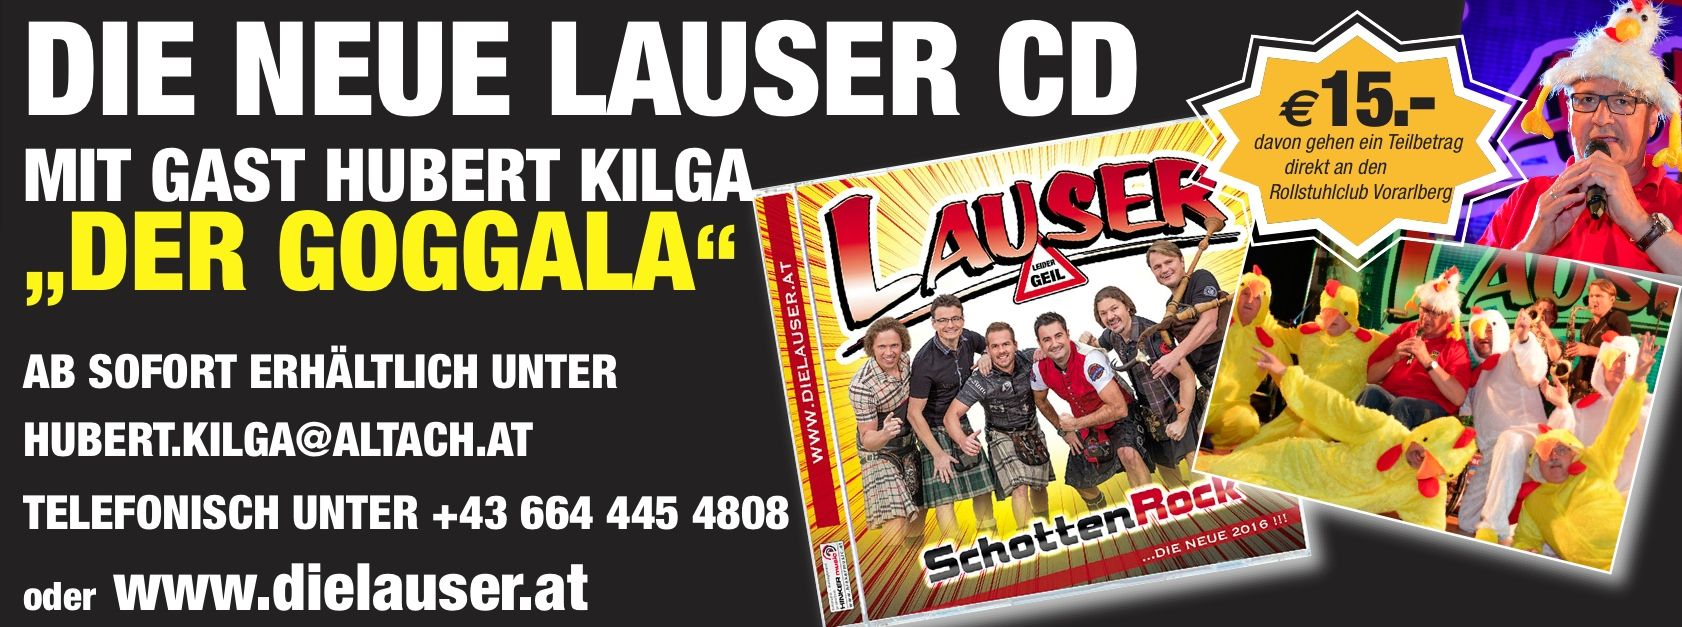 Lauser CD Goggalar